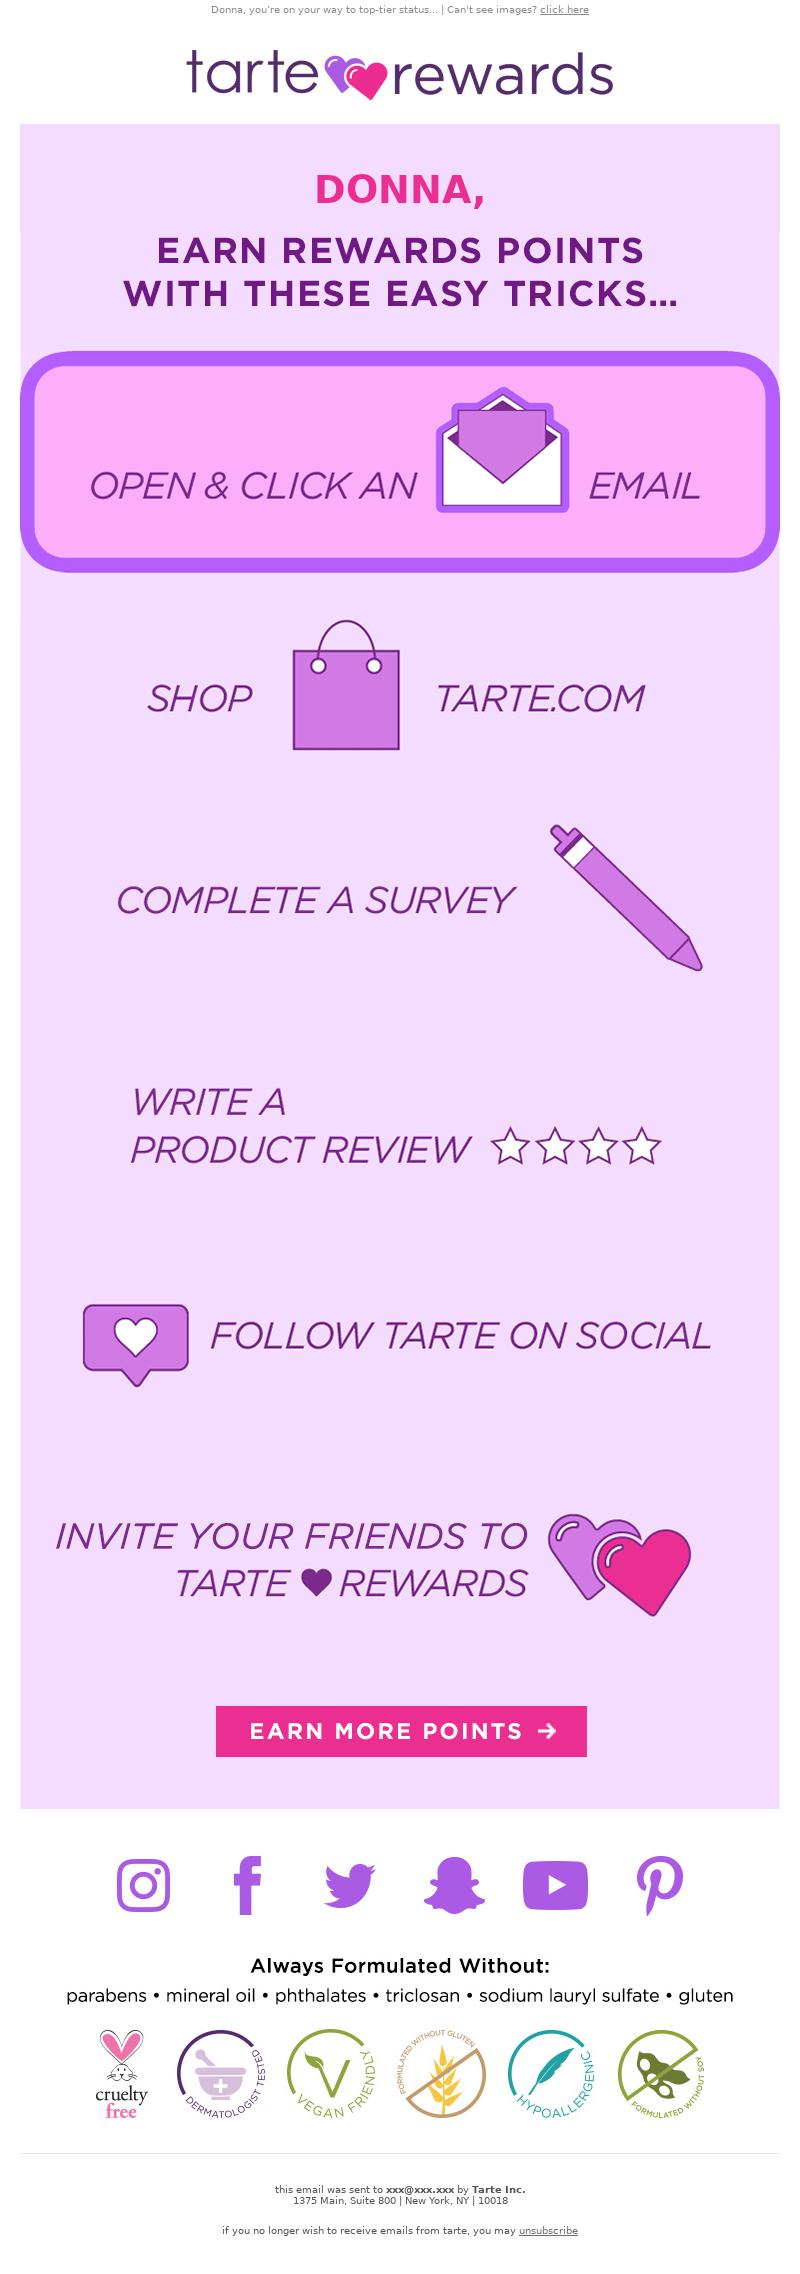 Tarte Cosmetics - 6 ways to earn tarte 💜 rewards points